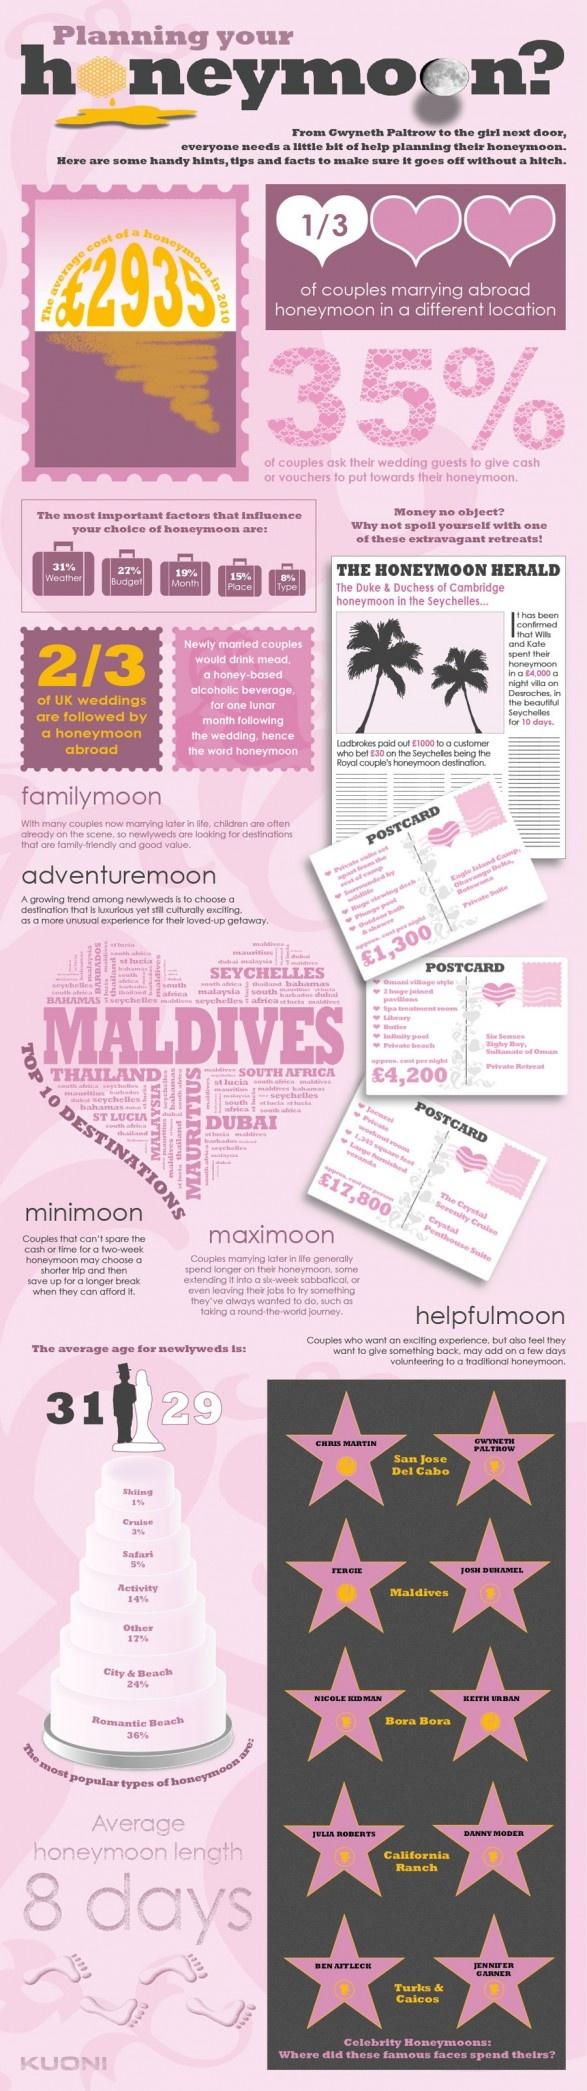 Planning Your Honeymoon: Honeymoons Ideas, Honeymoons Stuff, Honeymoons Infographic, Honeymoons Plans, Wedding, Dal Web, Honeymoons Inspiration, Infografich Dal, Future Ideas